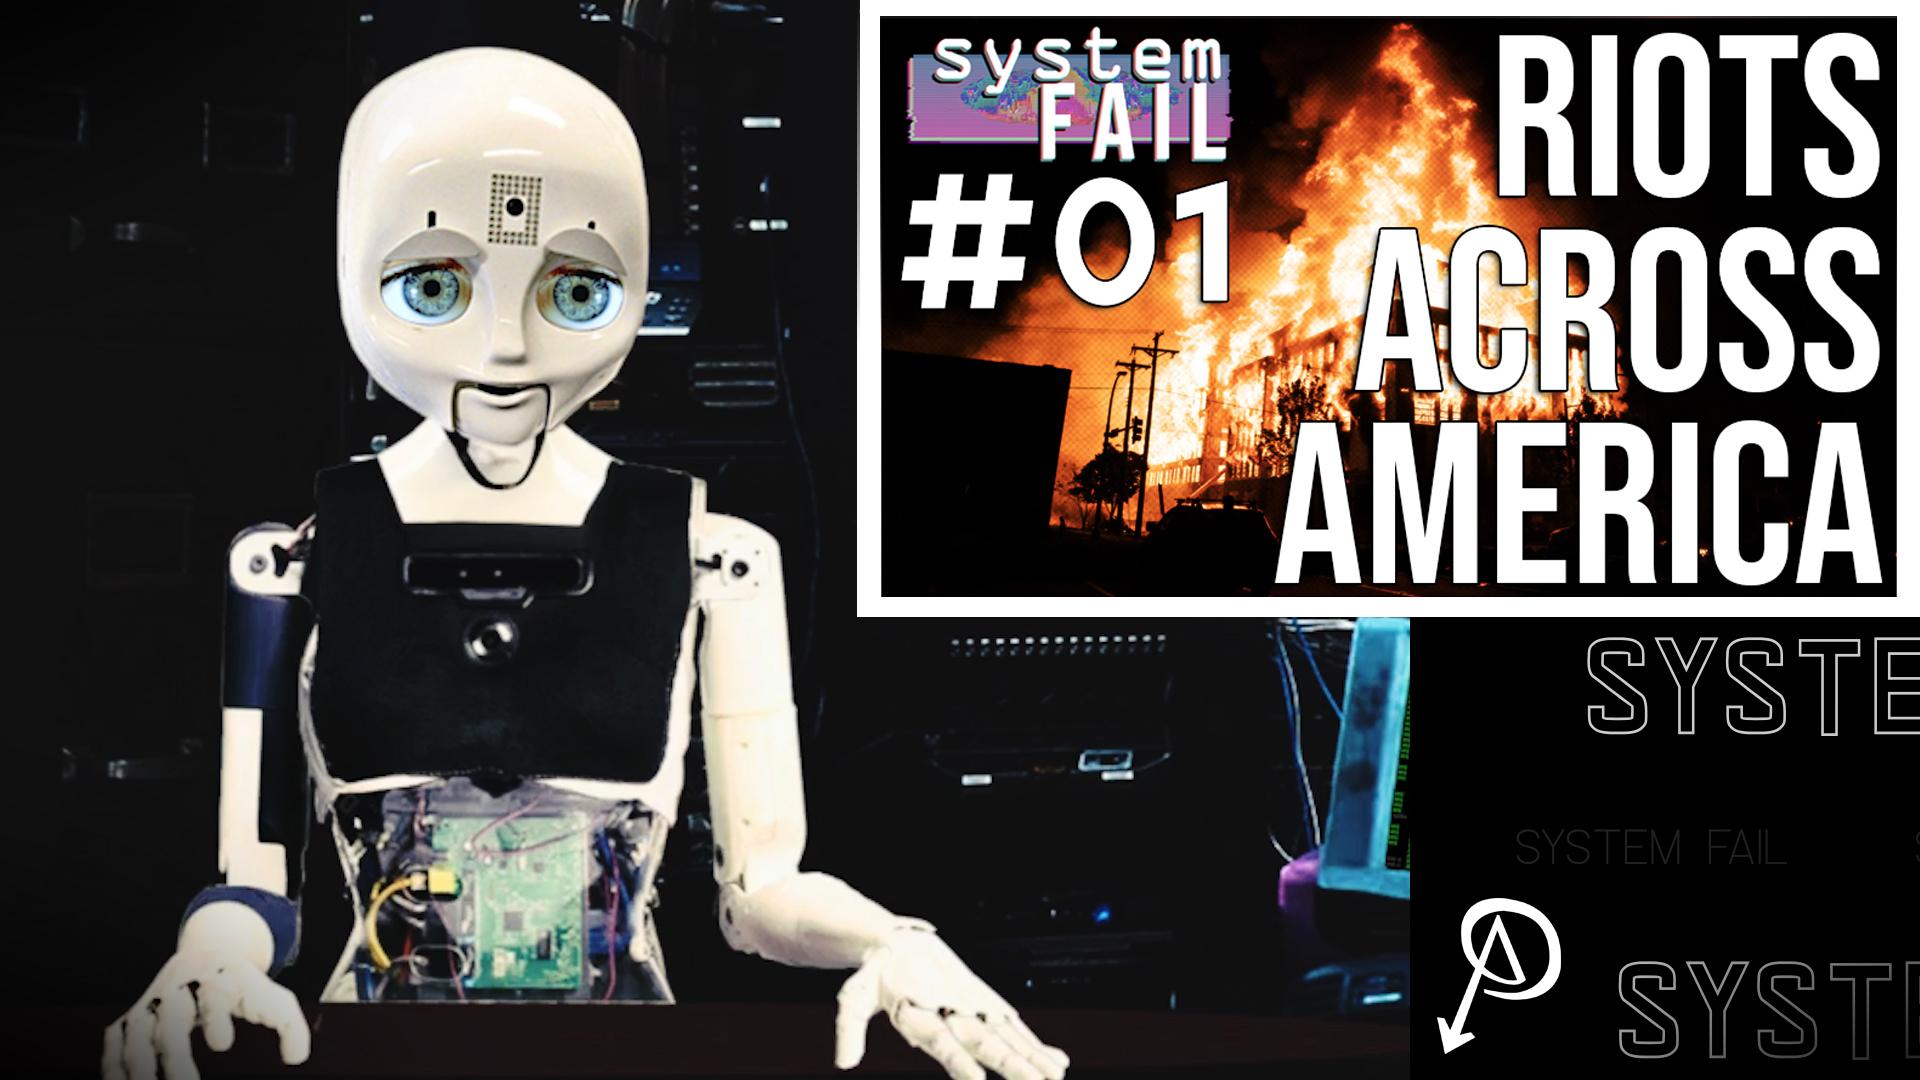 System Fail 01: Riots Across America